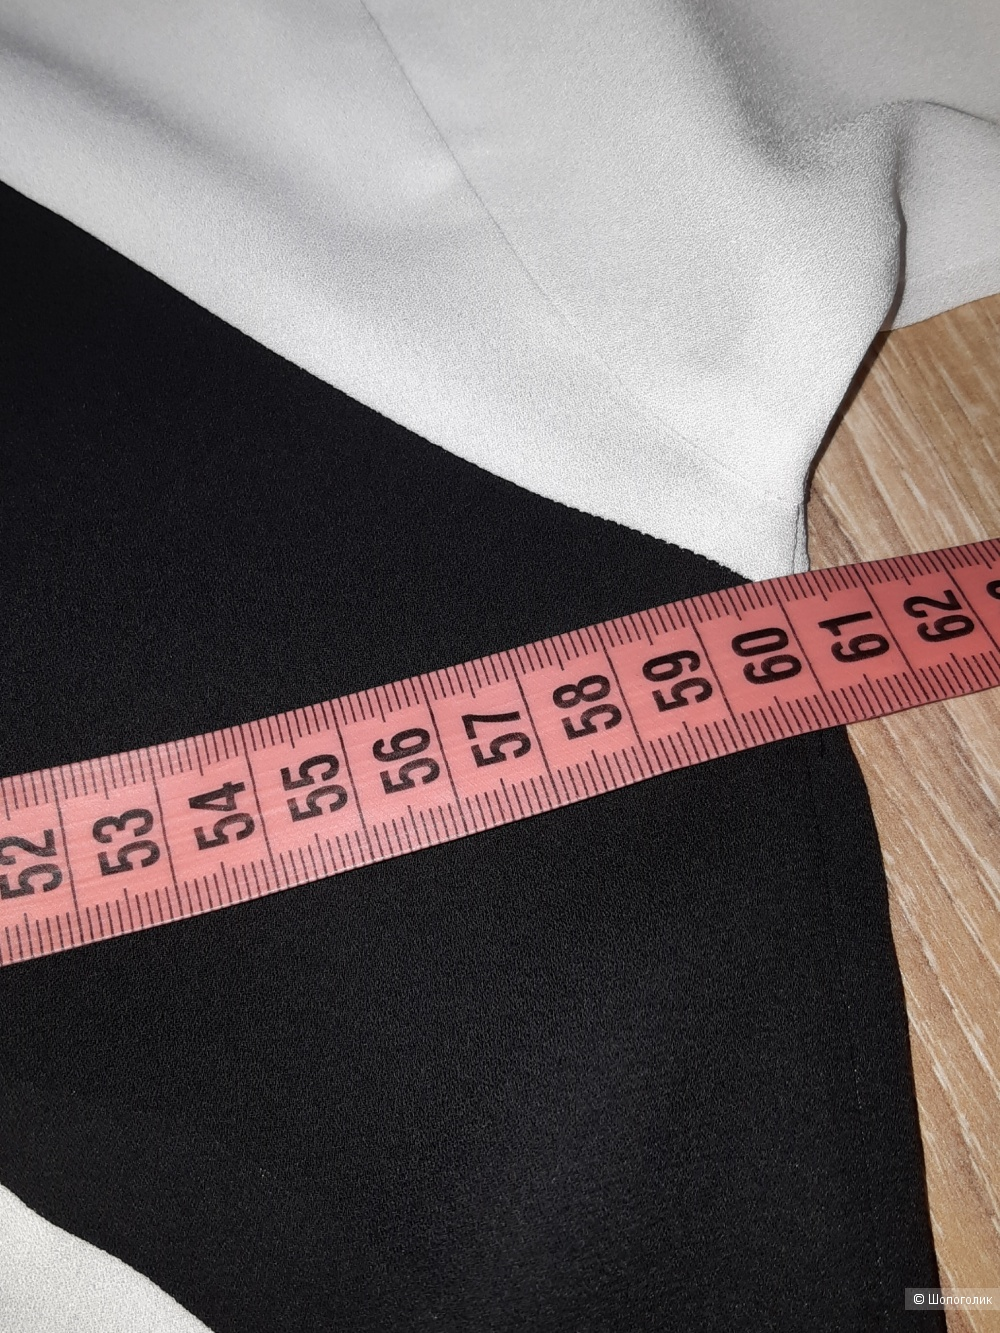 Свитшот adidas/equipment, размер m/l